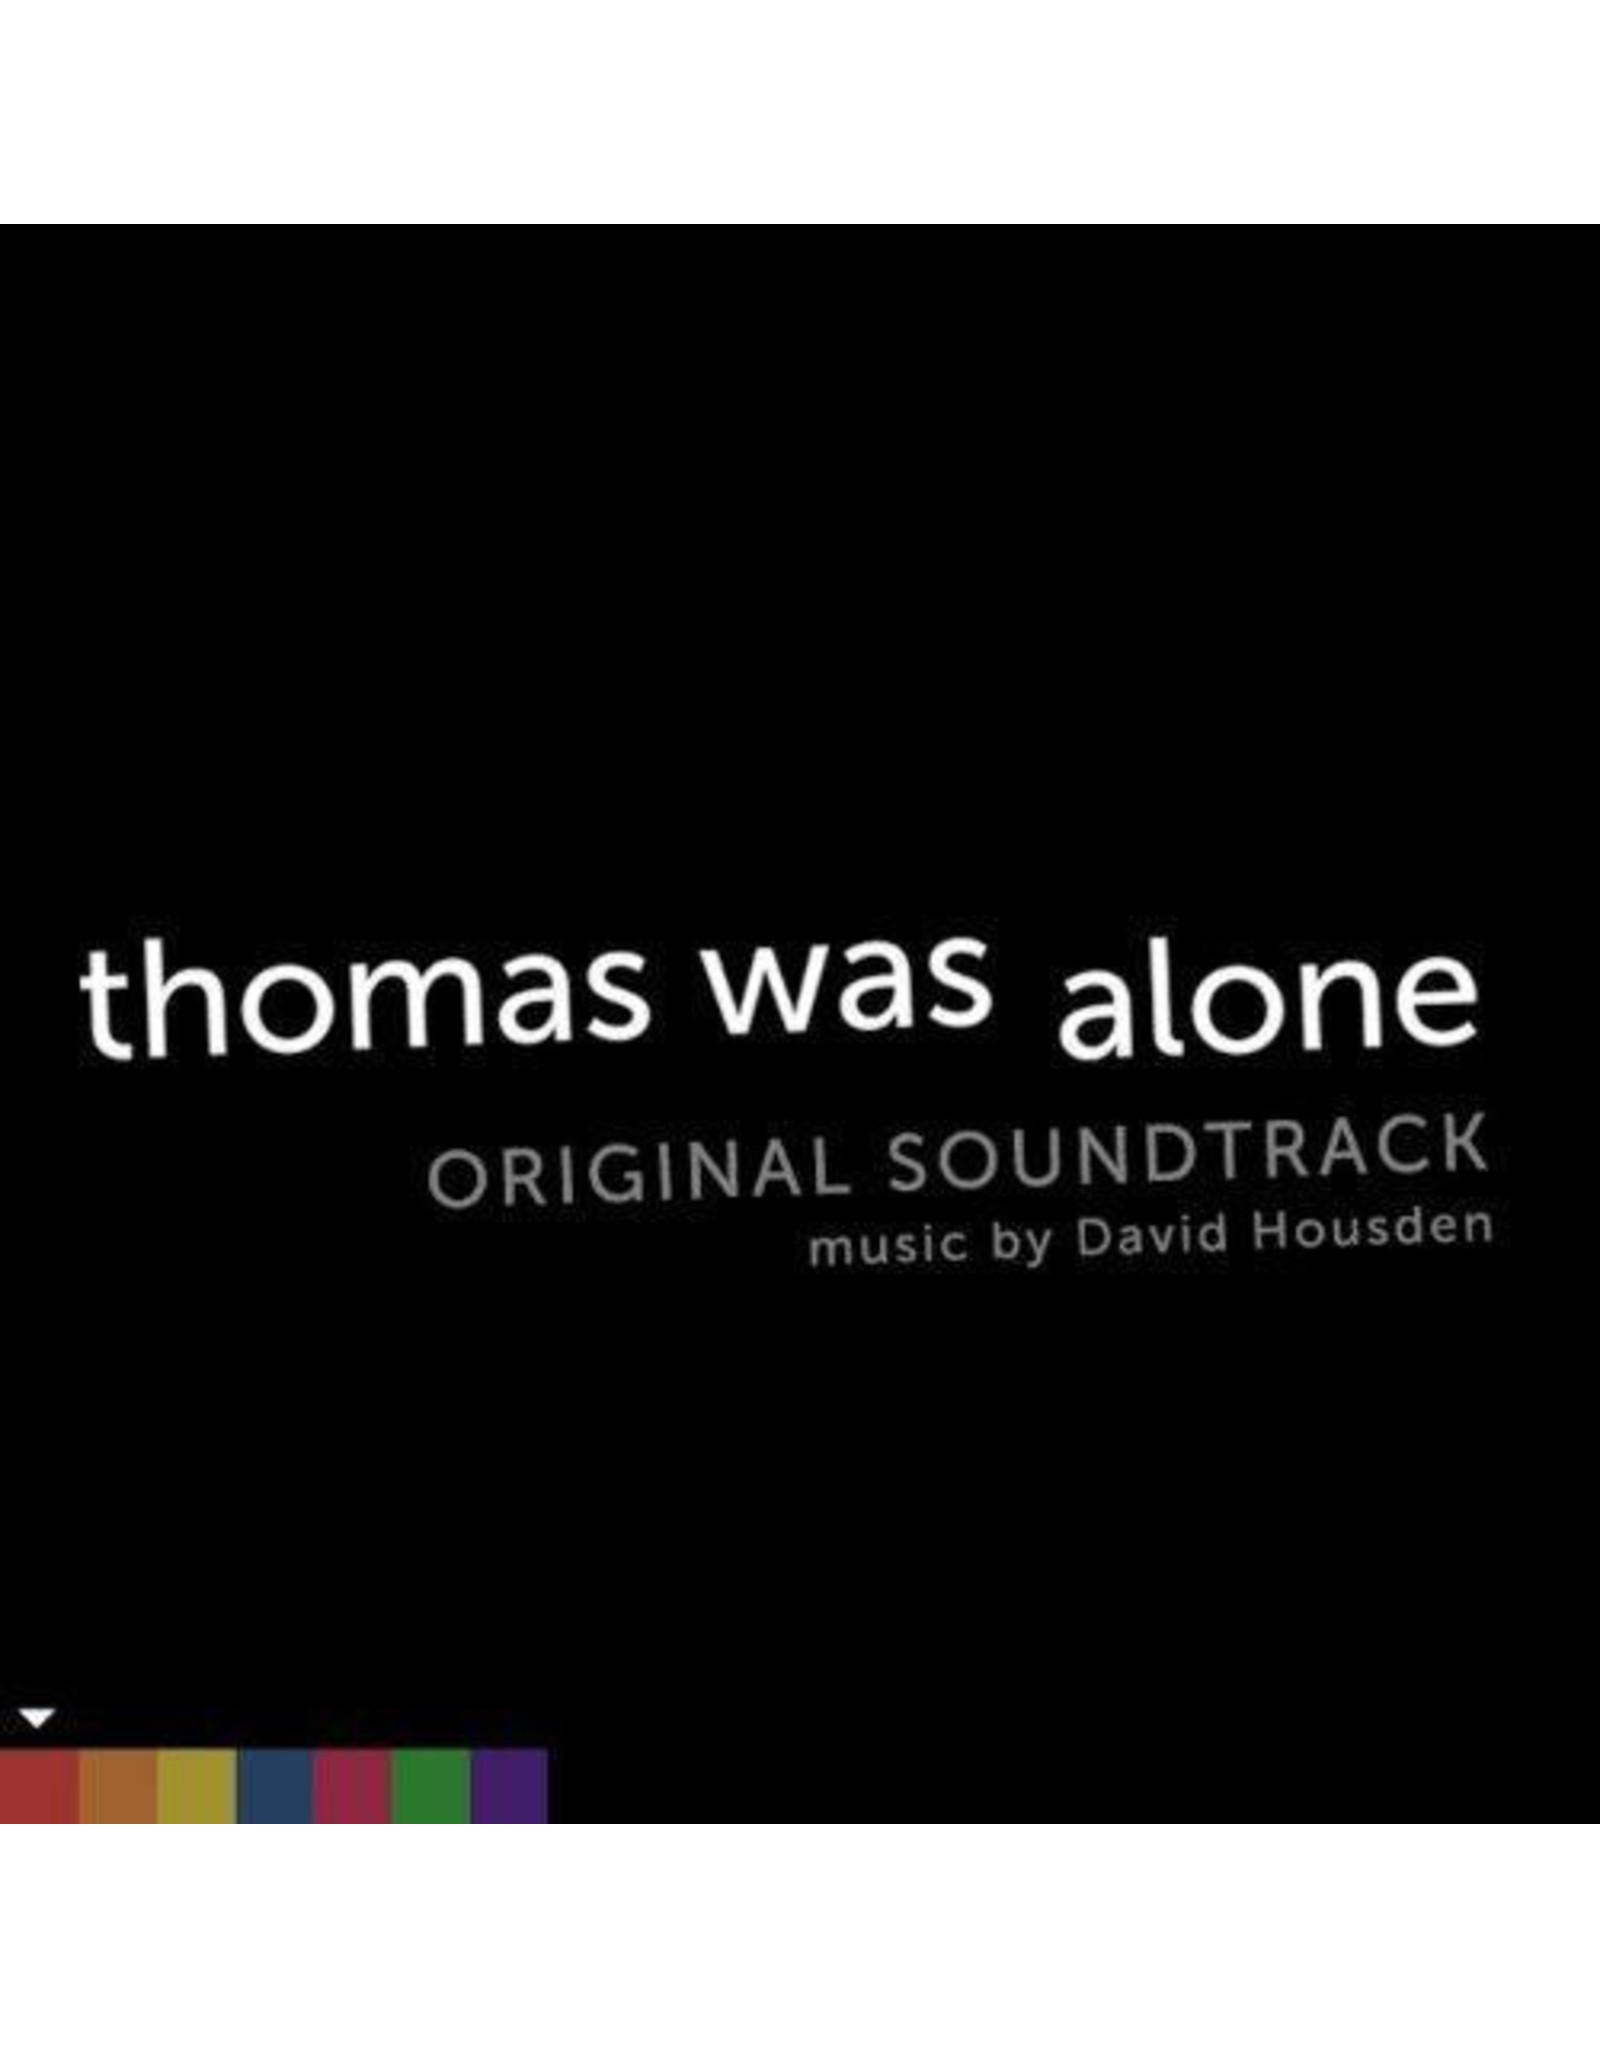 New Vinyl David Housden - Thomas Was Alone OST LP